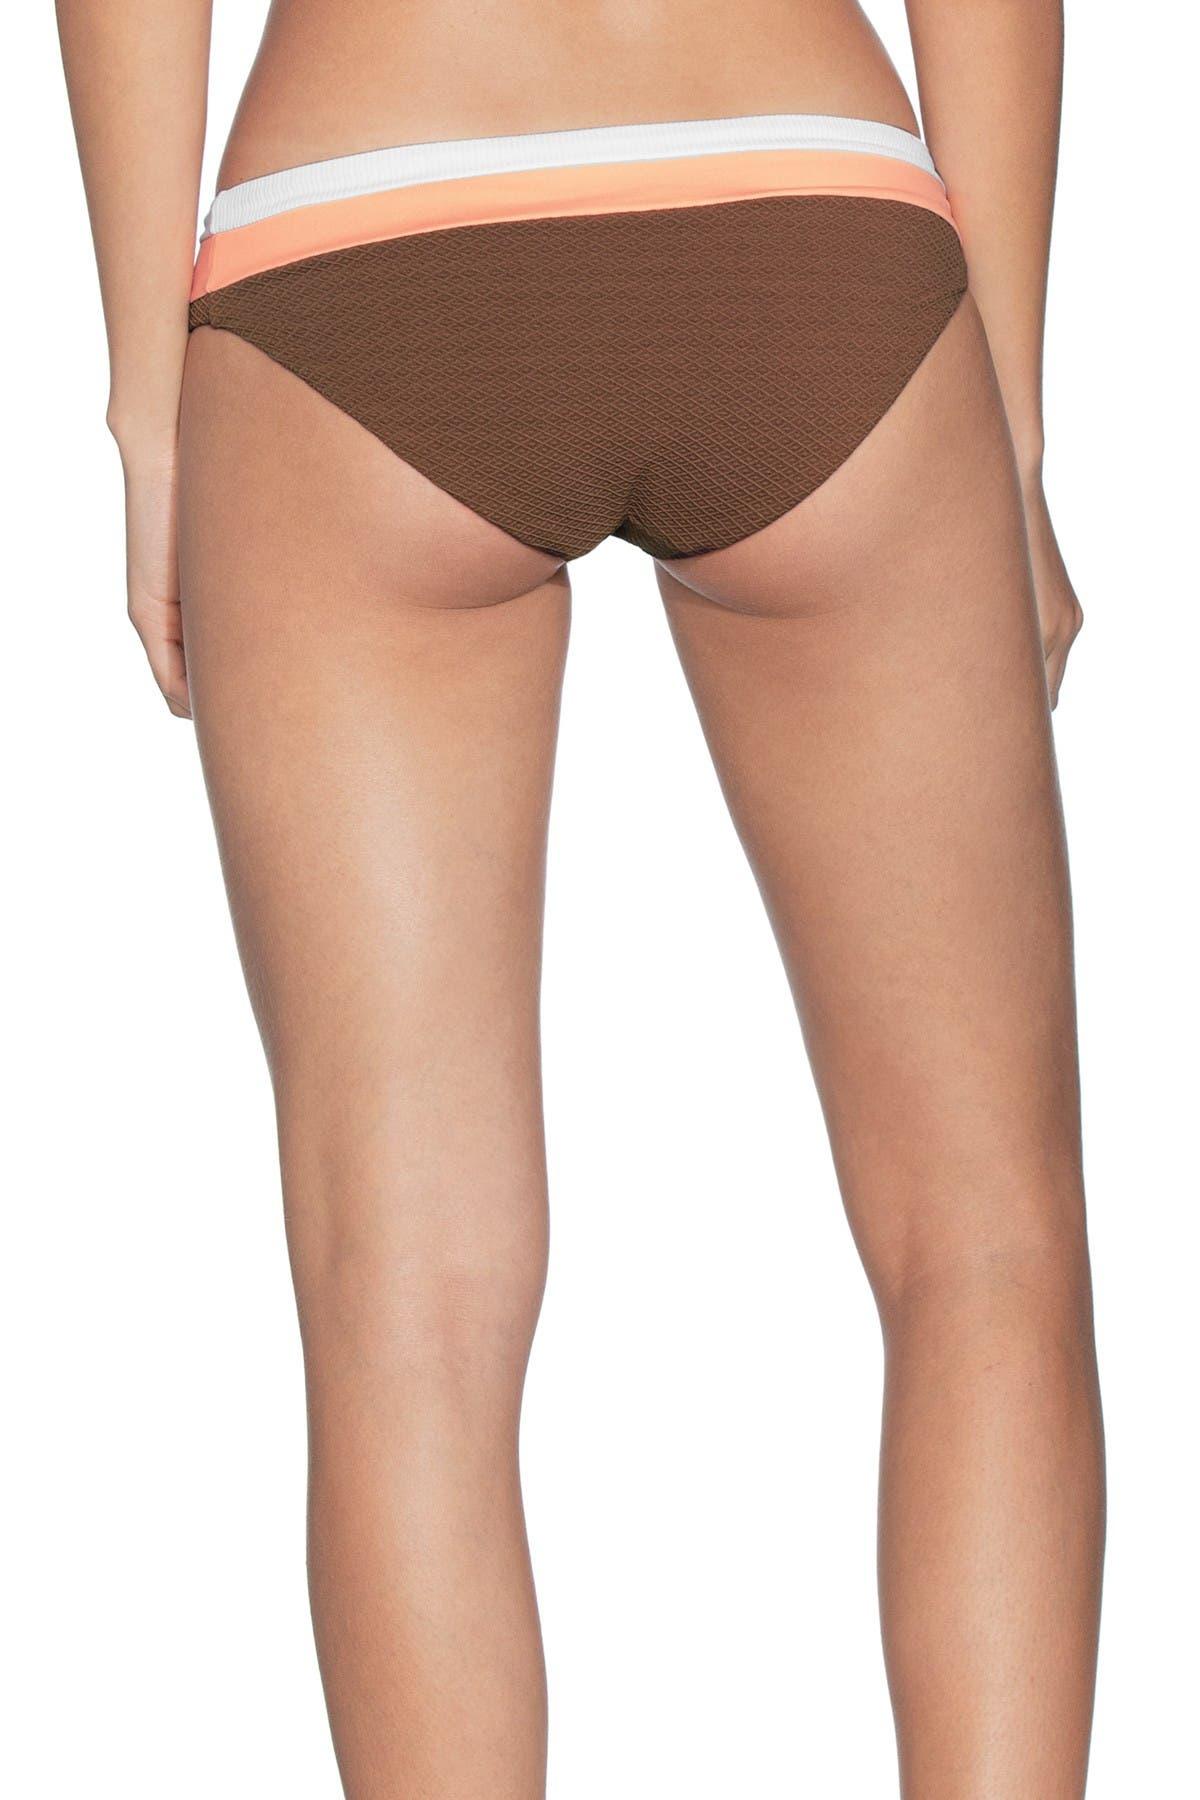 Image of Maaji Miranda Sublime Colorblock Reversible Bikini Bottoms